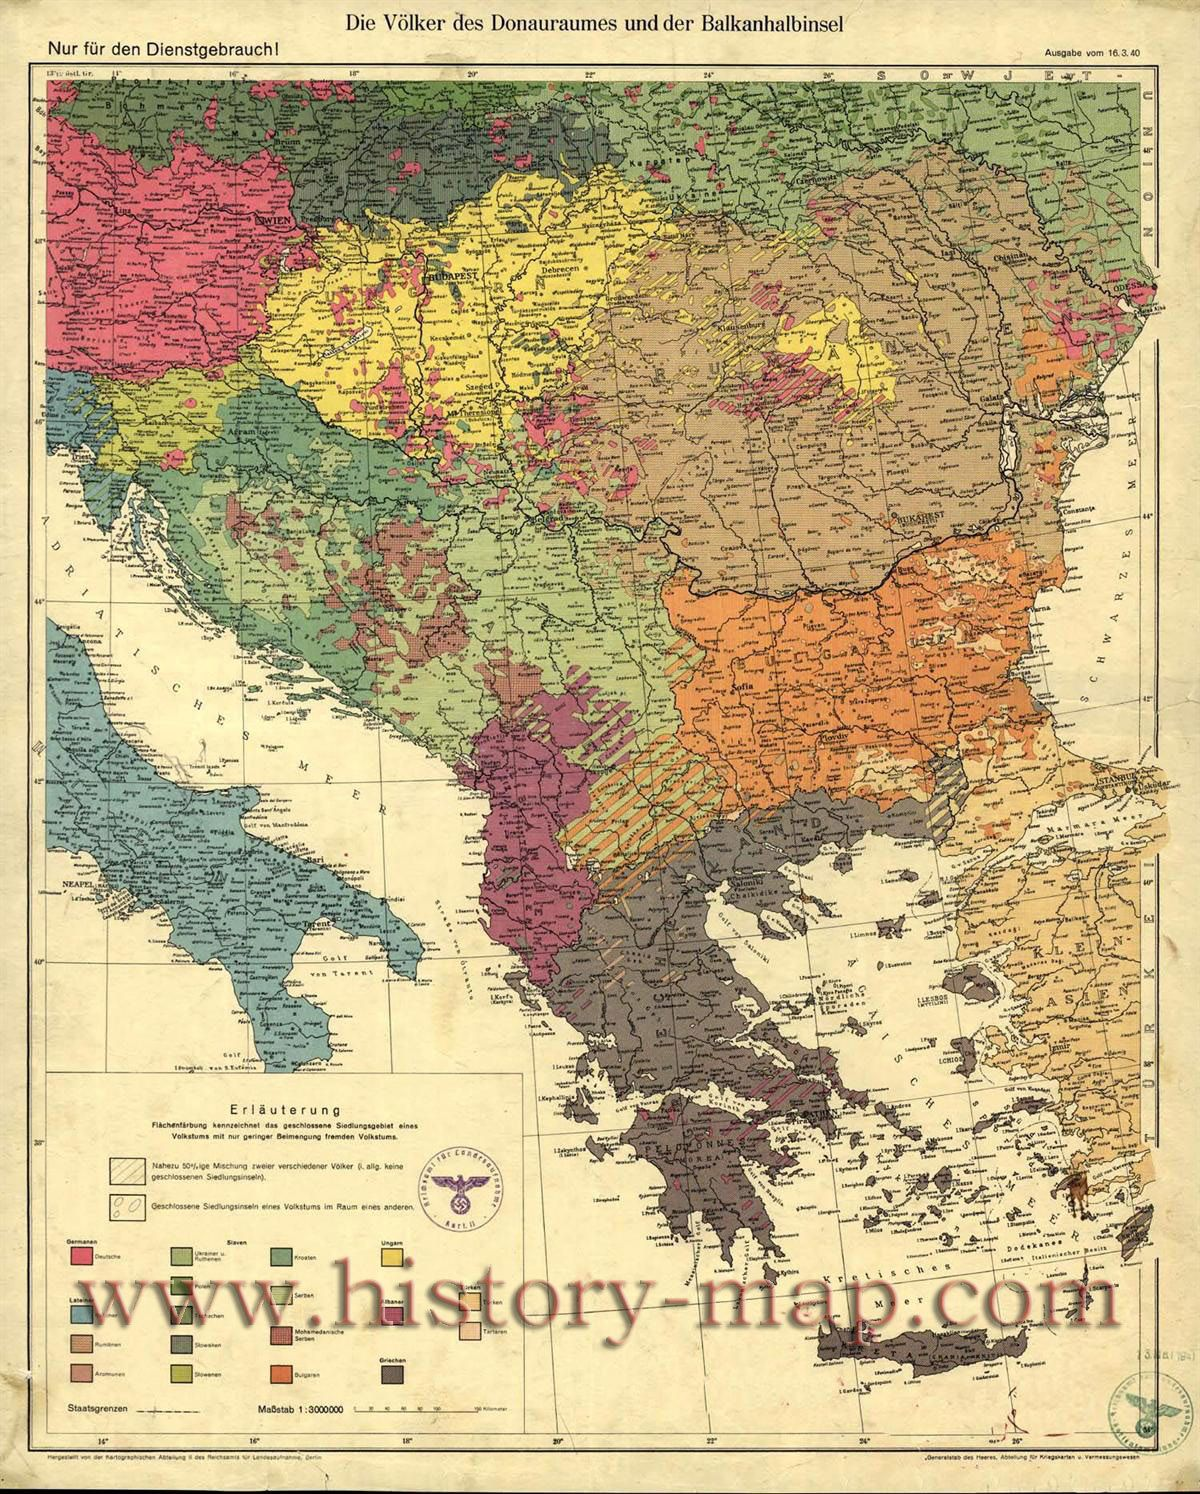 Map of the balkans 1940 map europe balkans europe maps map of the balkans 1940 map europe balkans sciox Gallery